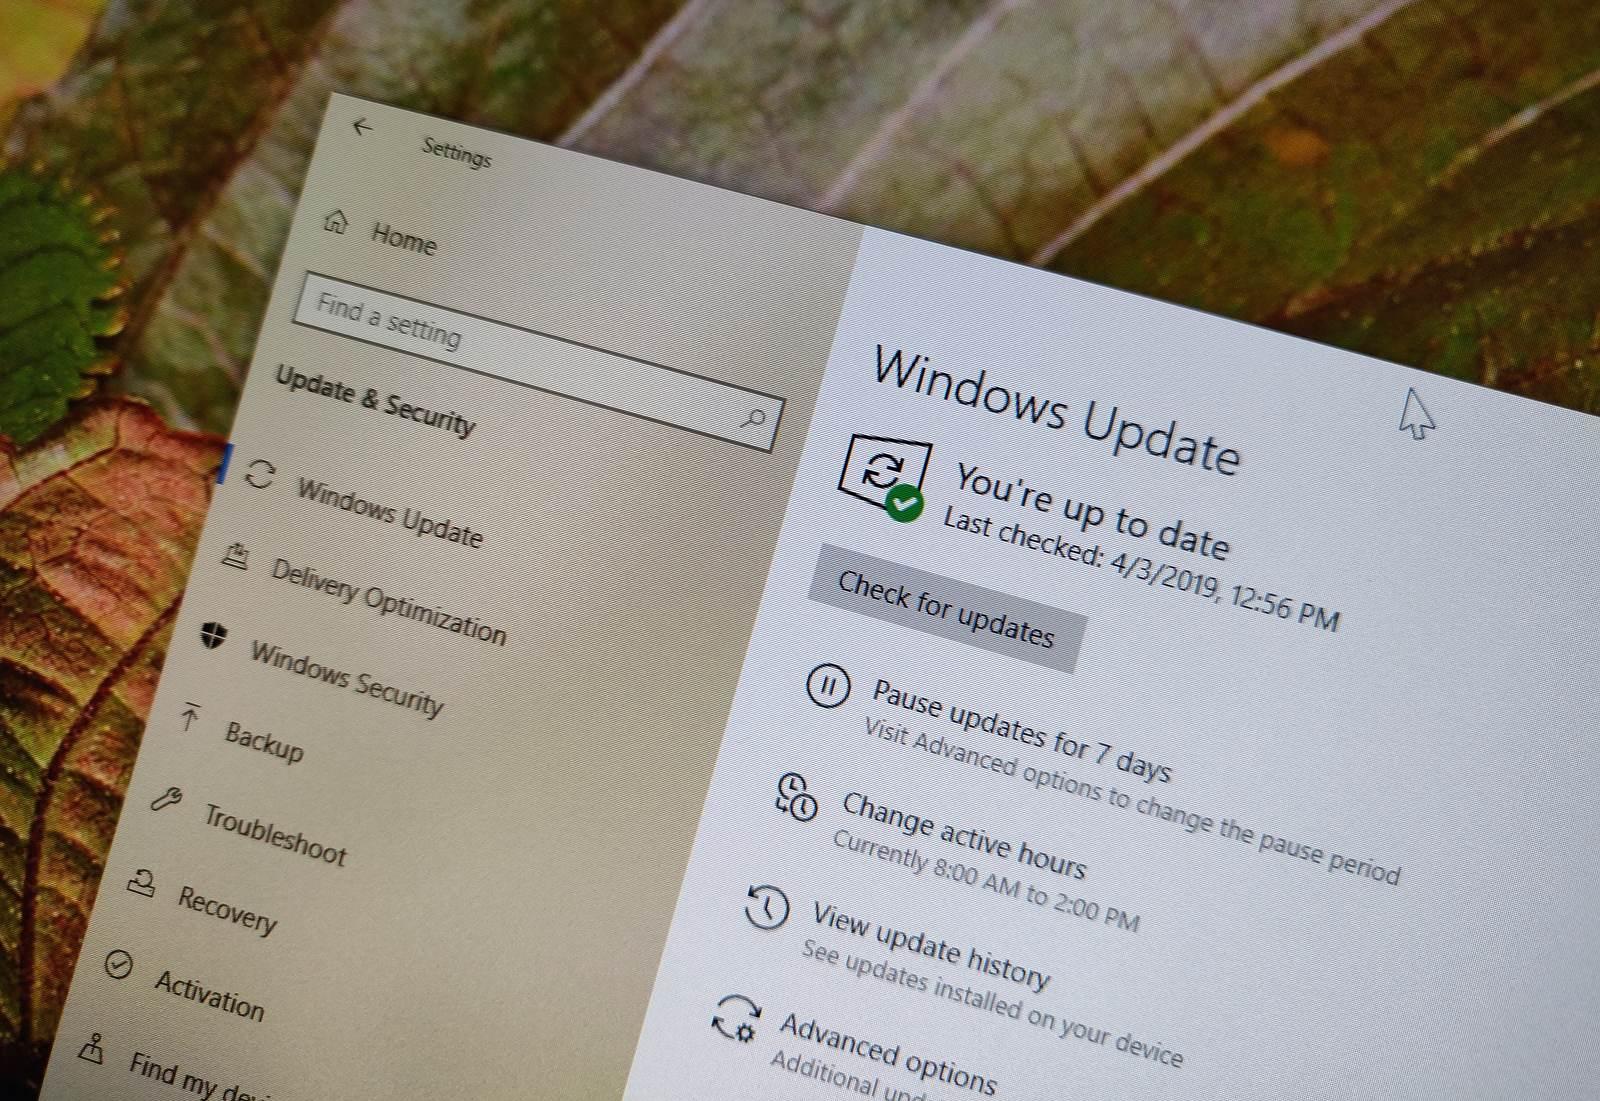 Windows 10 version 1903 update settings